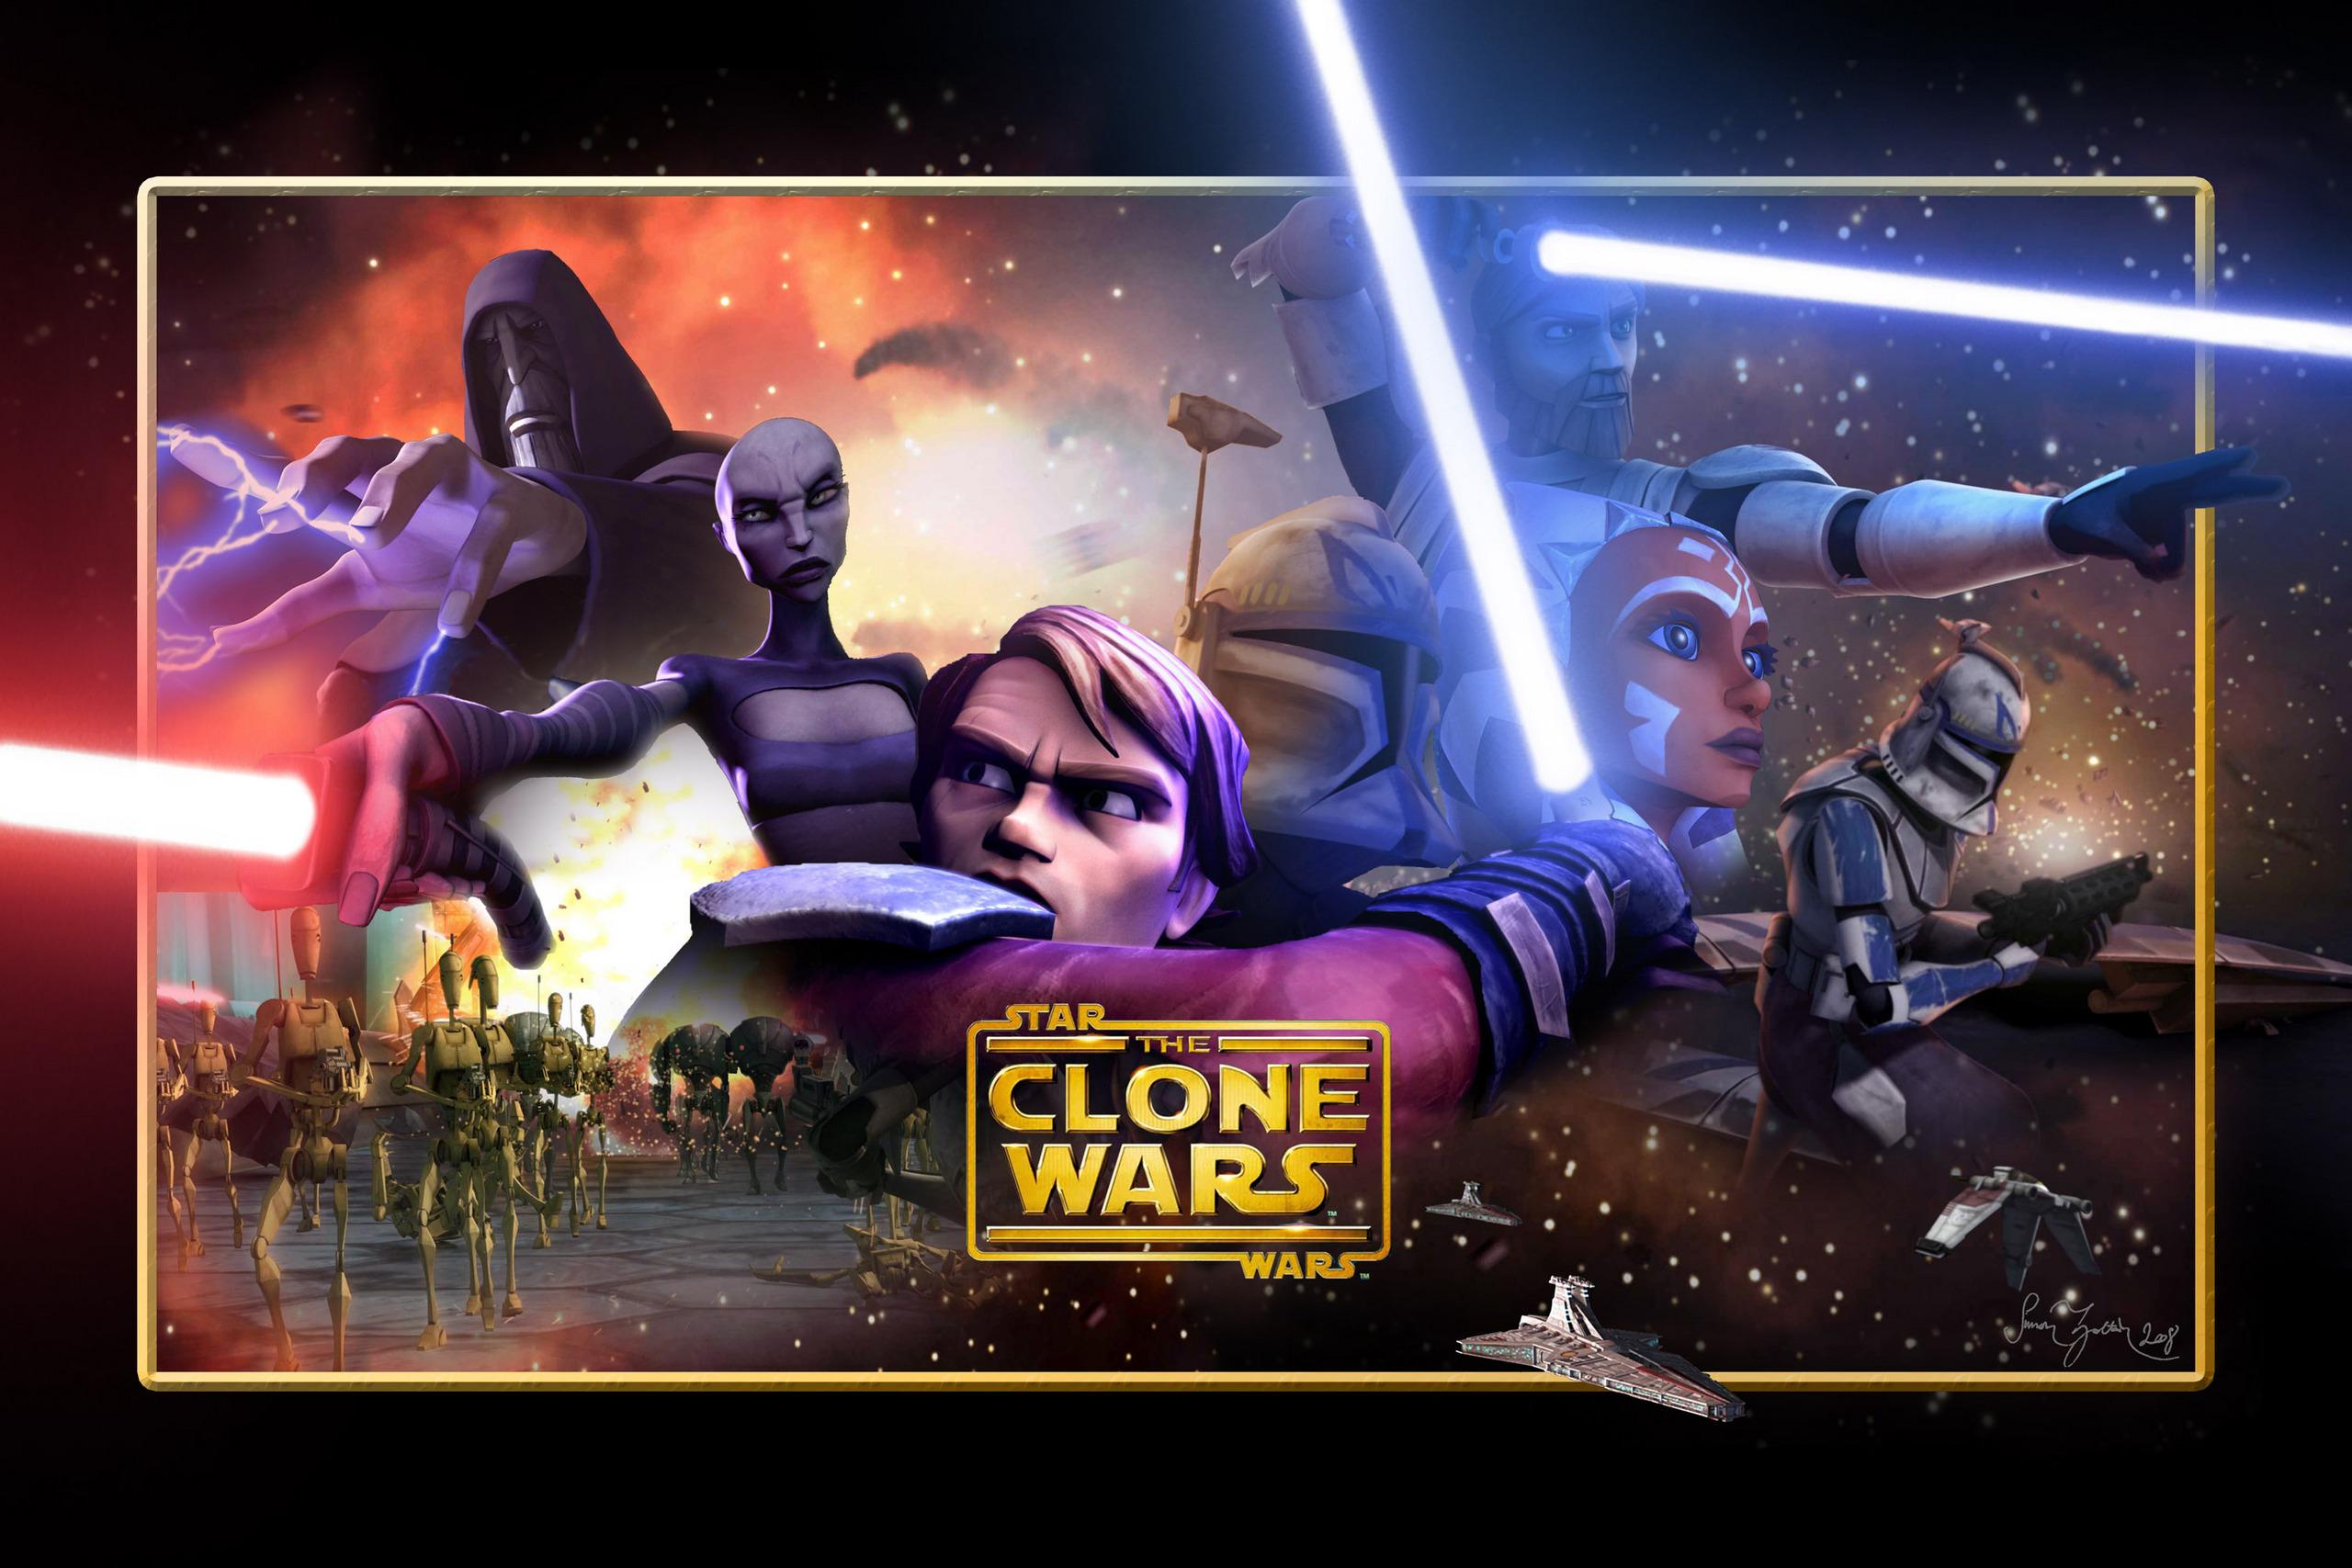 Obi wan anakin and ahsoka star wars clone wars